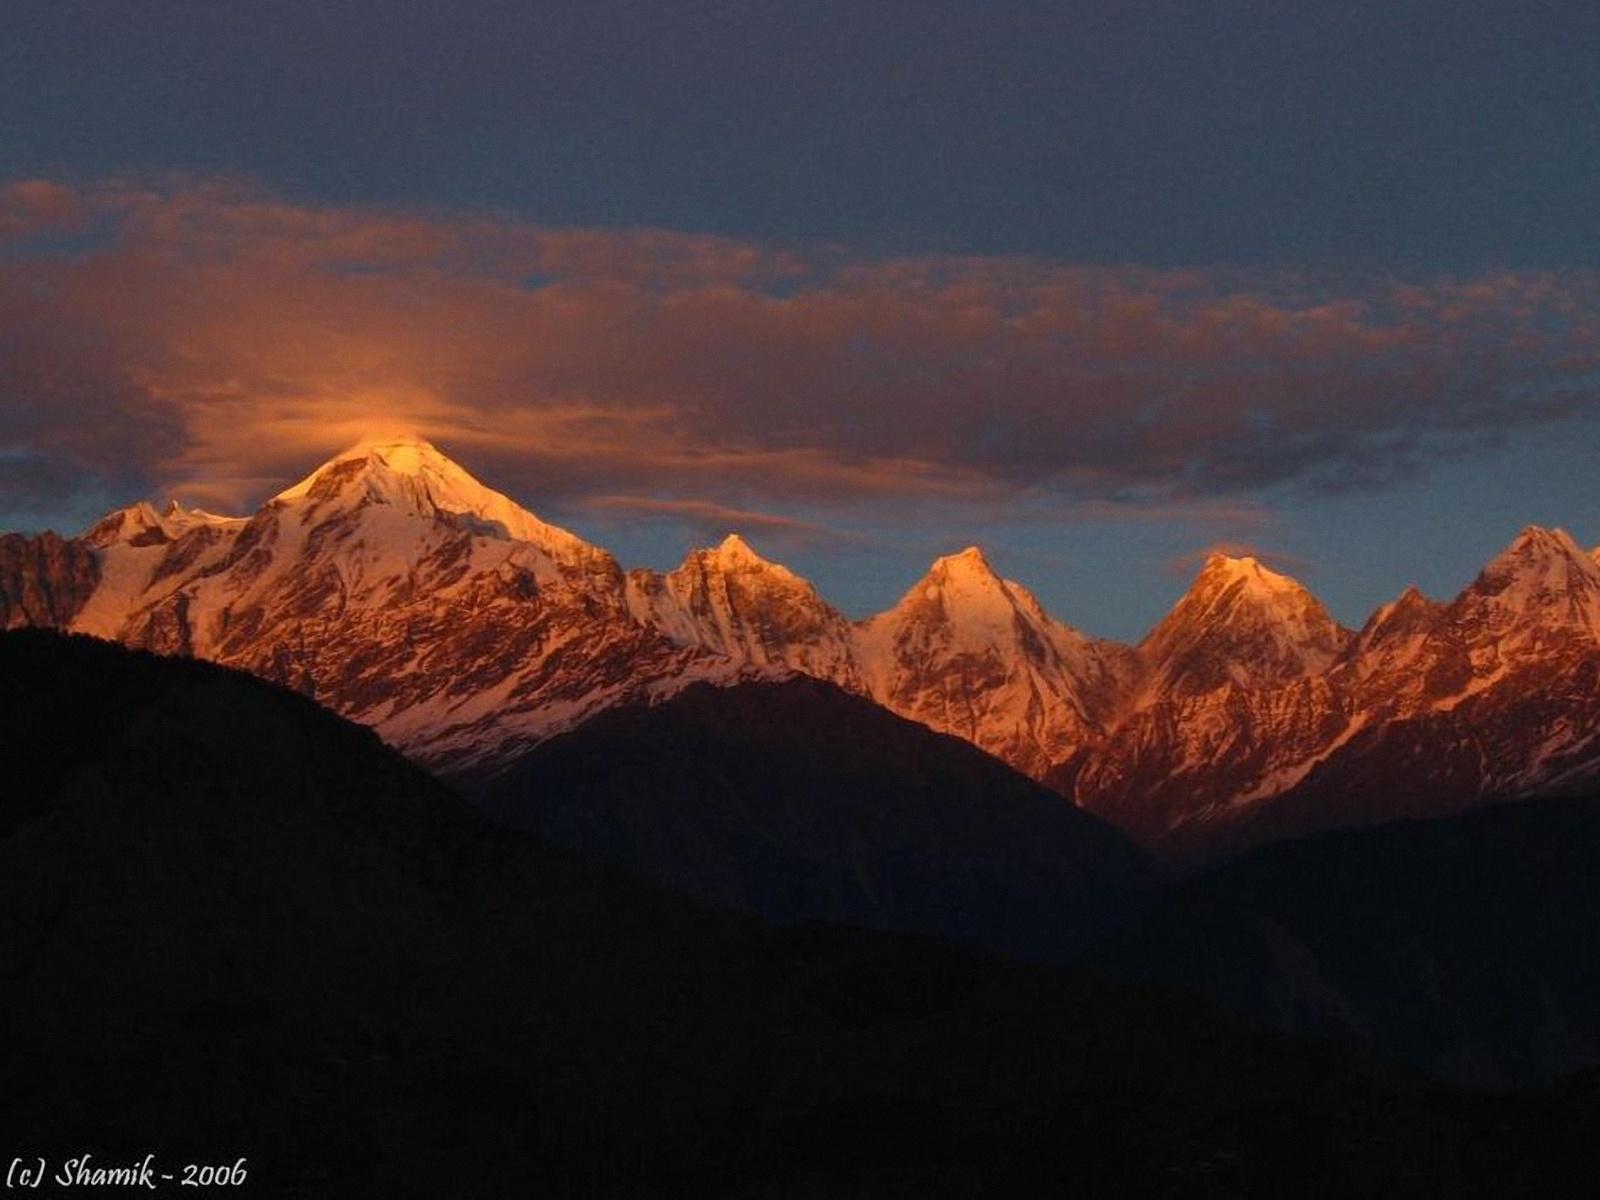 Himalayas in the Dark 1600x1200 WallpapersHimalayas India 1600x1200 1600x1200